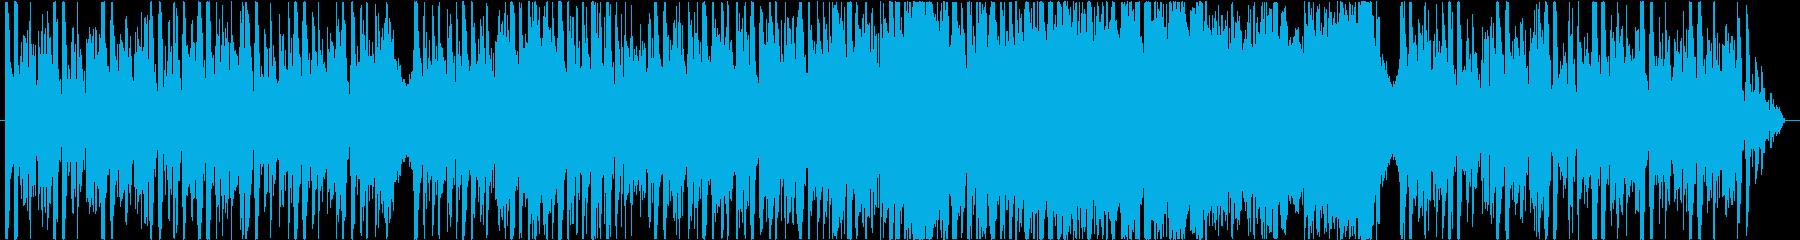 【Loop】クワイアの壮大な戦闘BGMの再生済みの波形